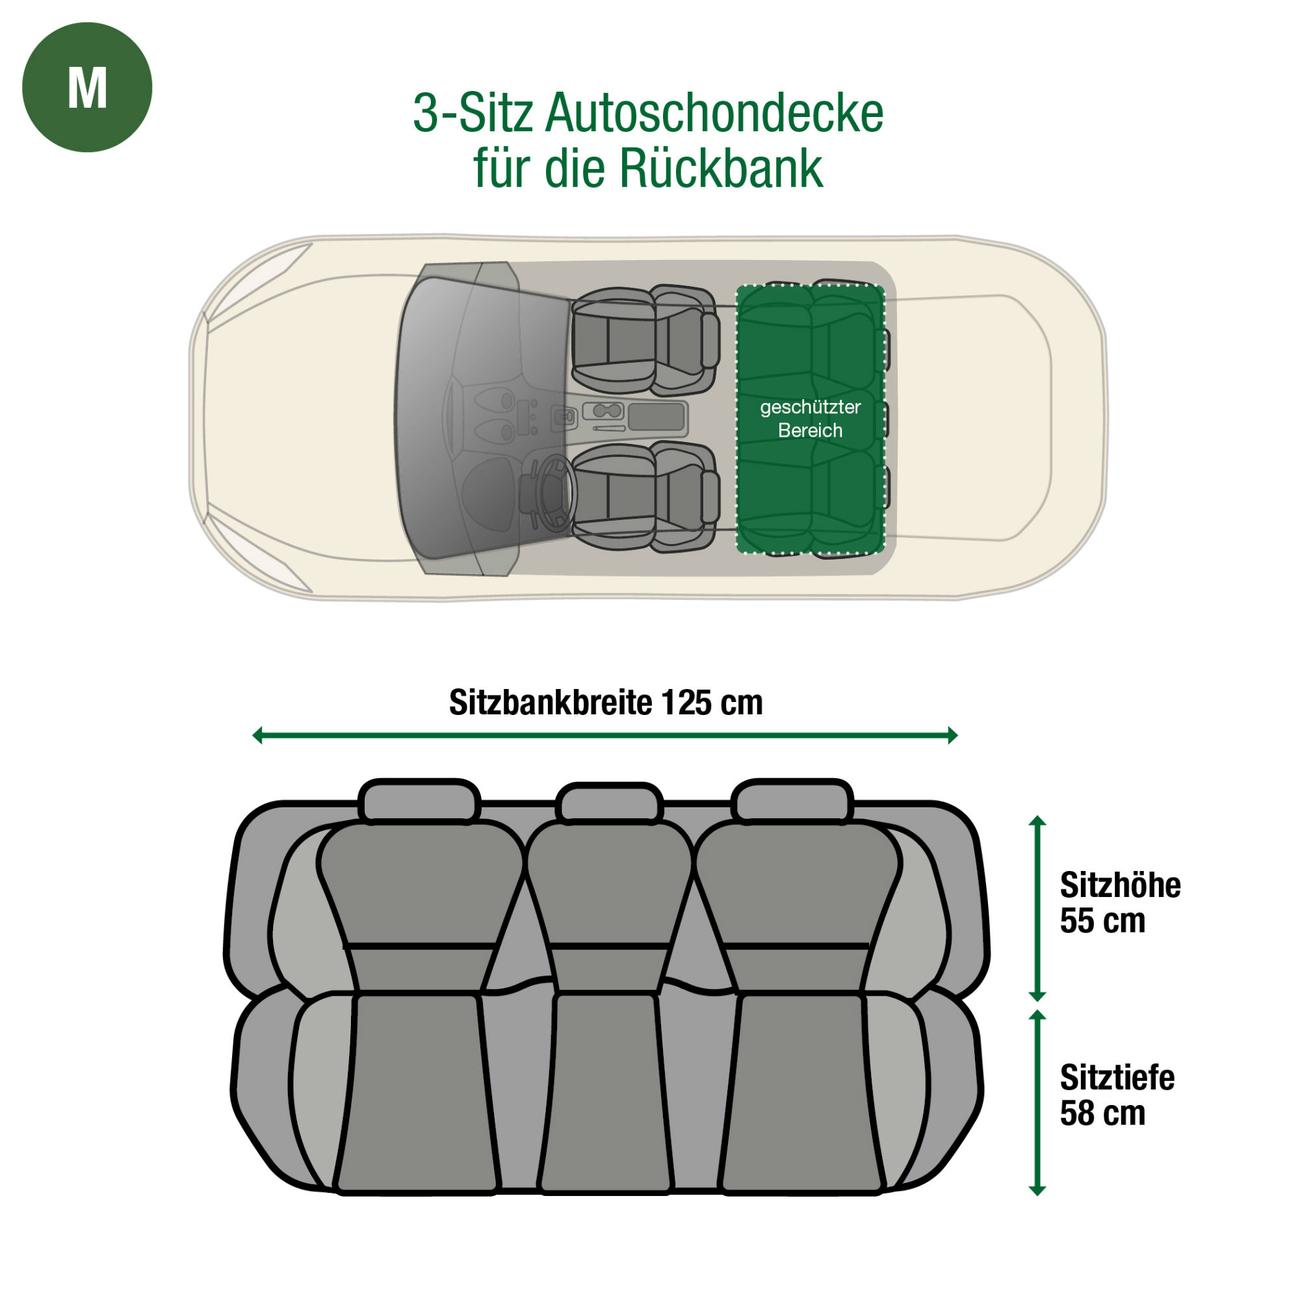 Doctor Bark Autodecke 3-Sitz Rücksitz, Bild 22